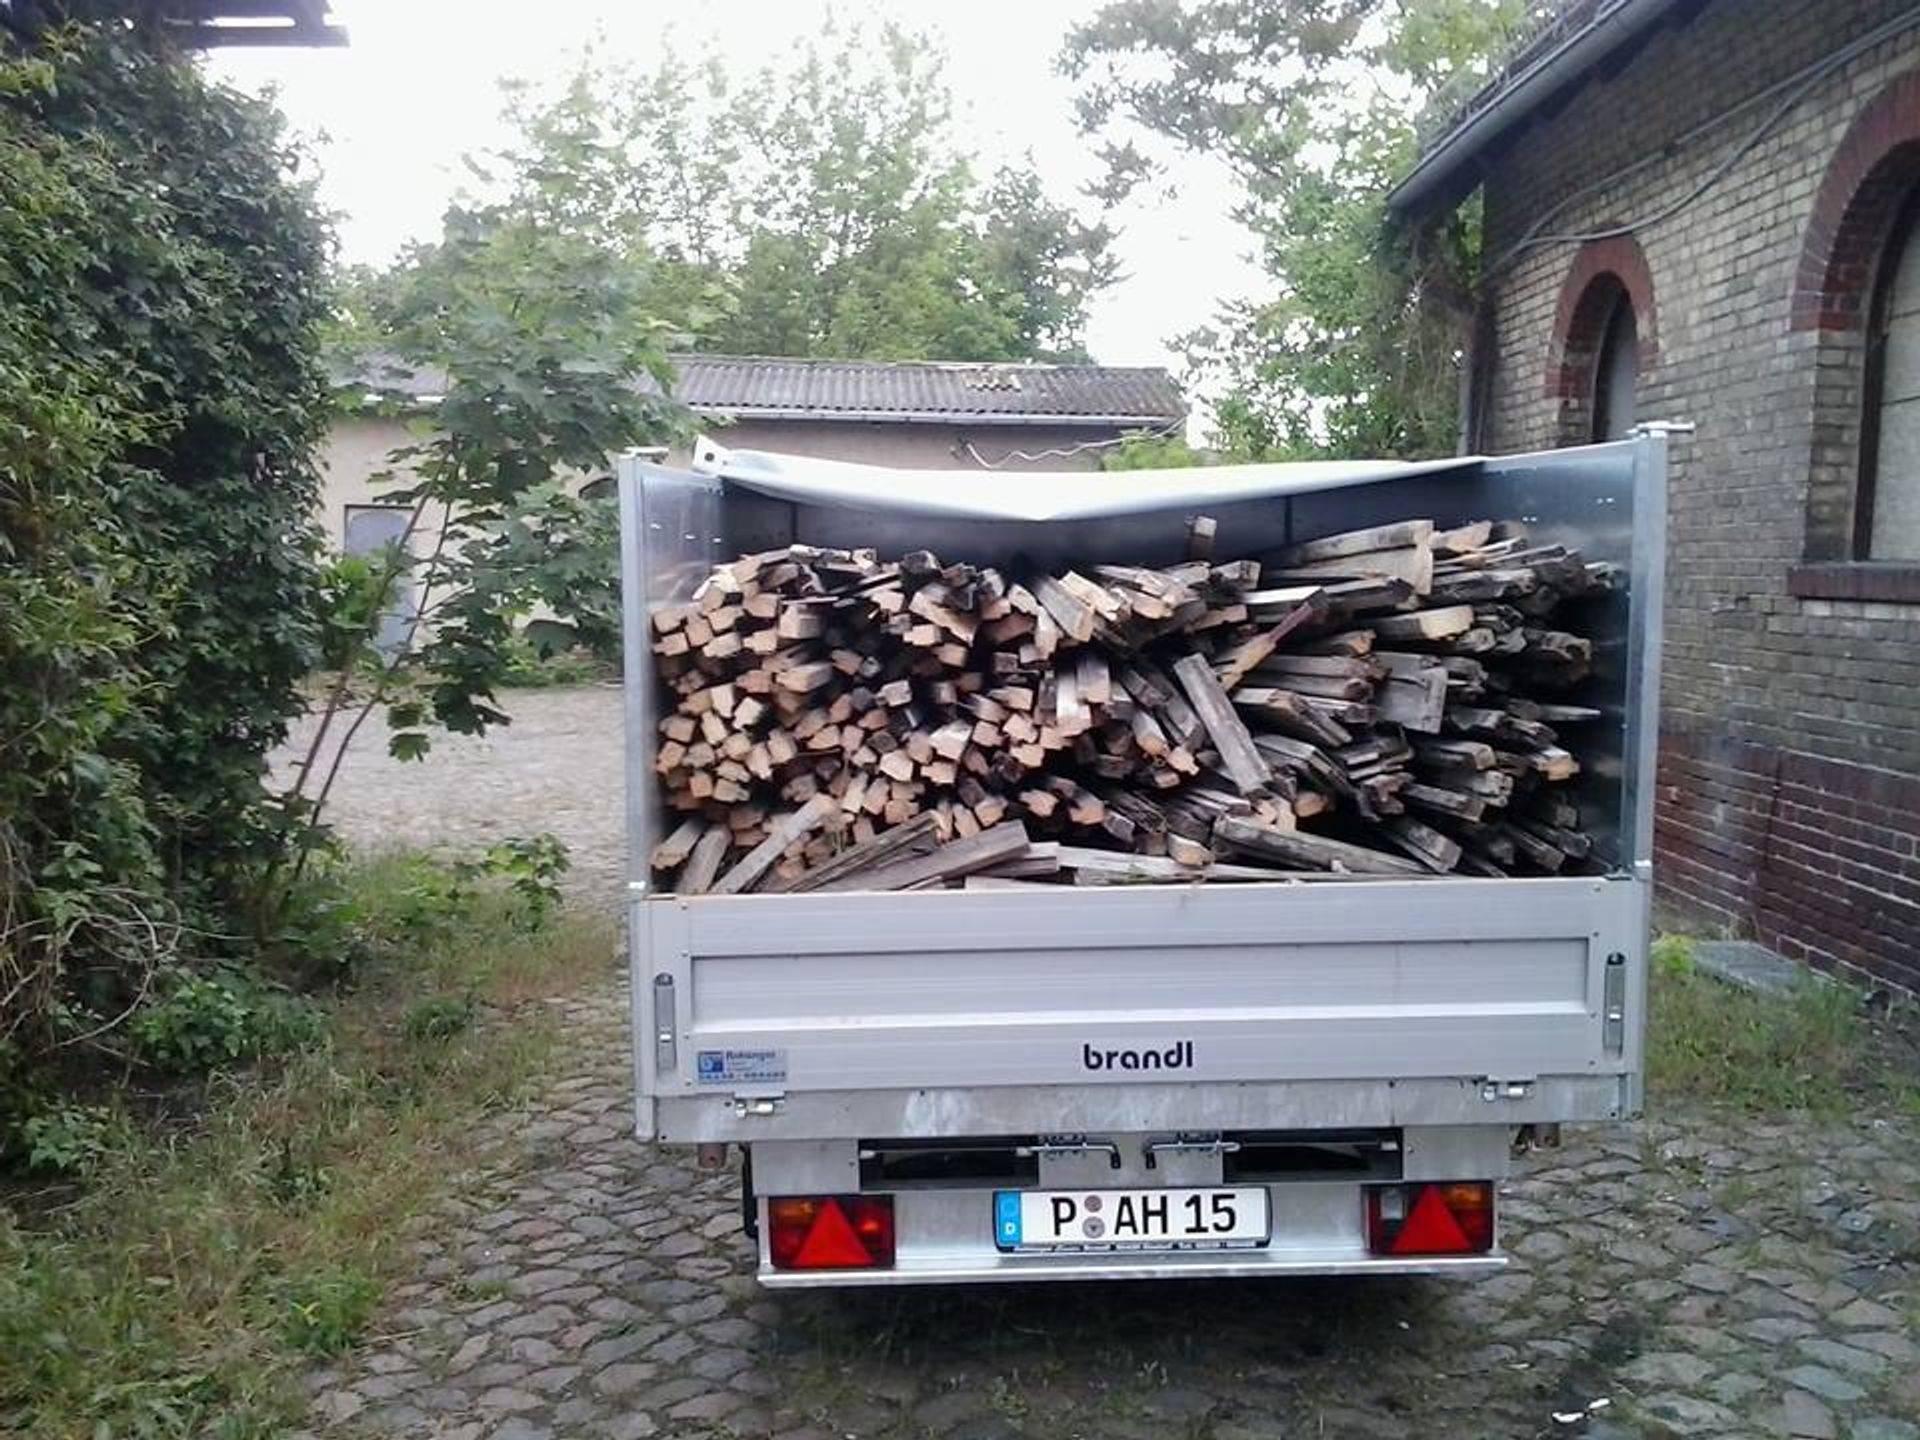 Entsorgung Holz Potsdam, Berlin, Kleinmachnow, Teltow, Werder / Havel, Falkensee, Nuthetal, Ludwigsfelde, Beelitz